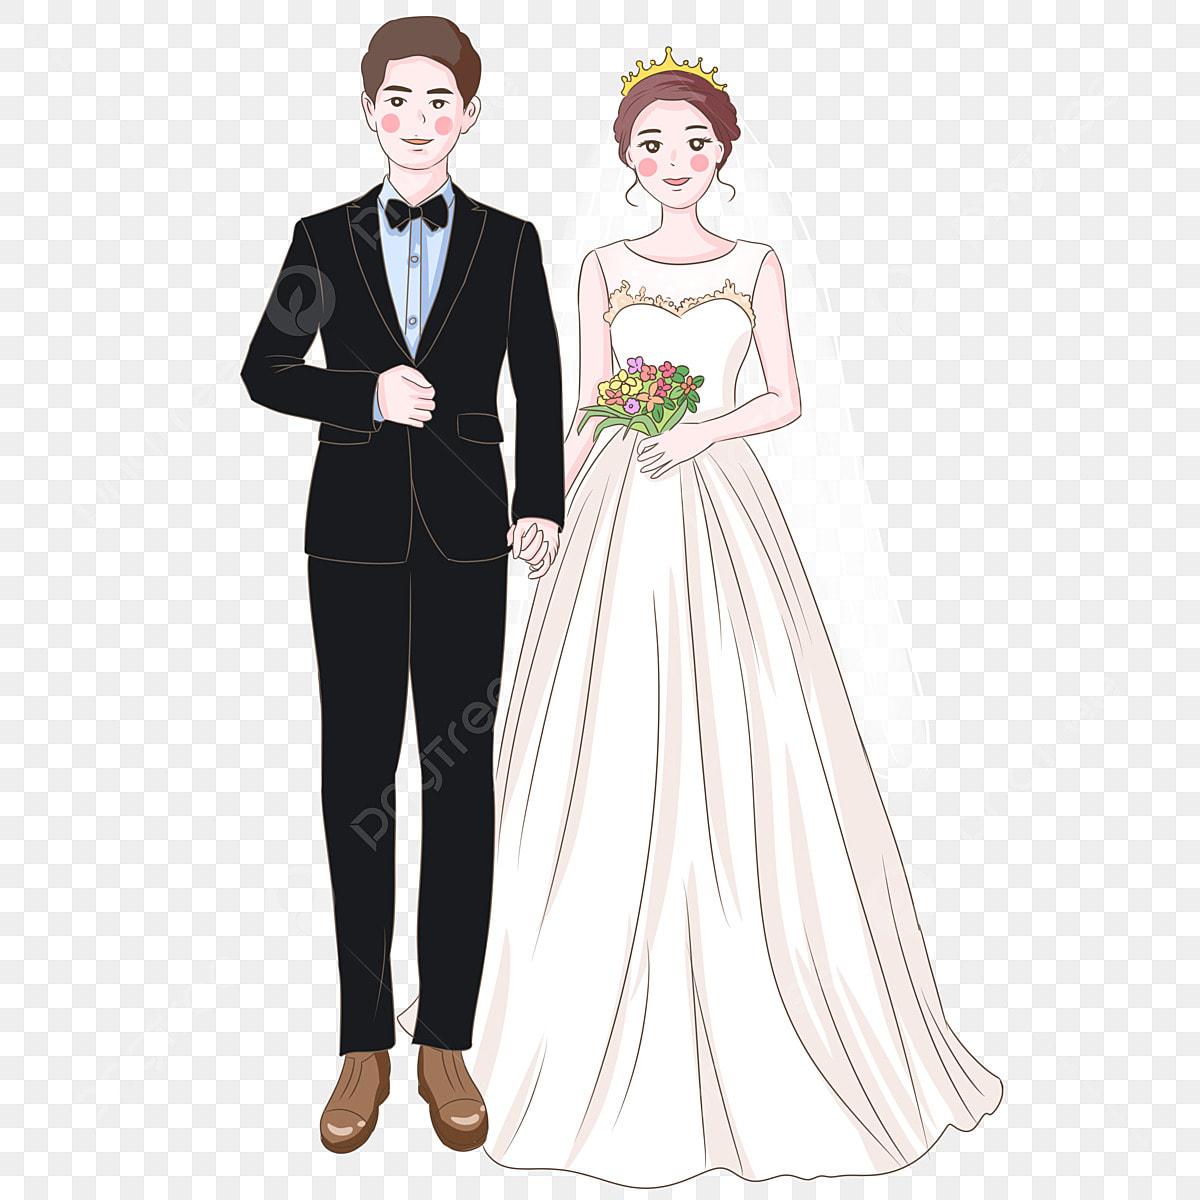 de3c04760 Casarse Vestido De Novia Traje Novia Y Novio, Novia Y Novio, Traje ...